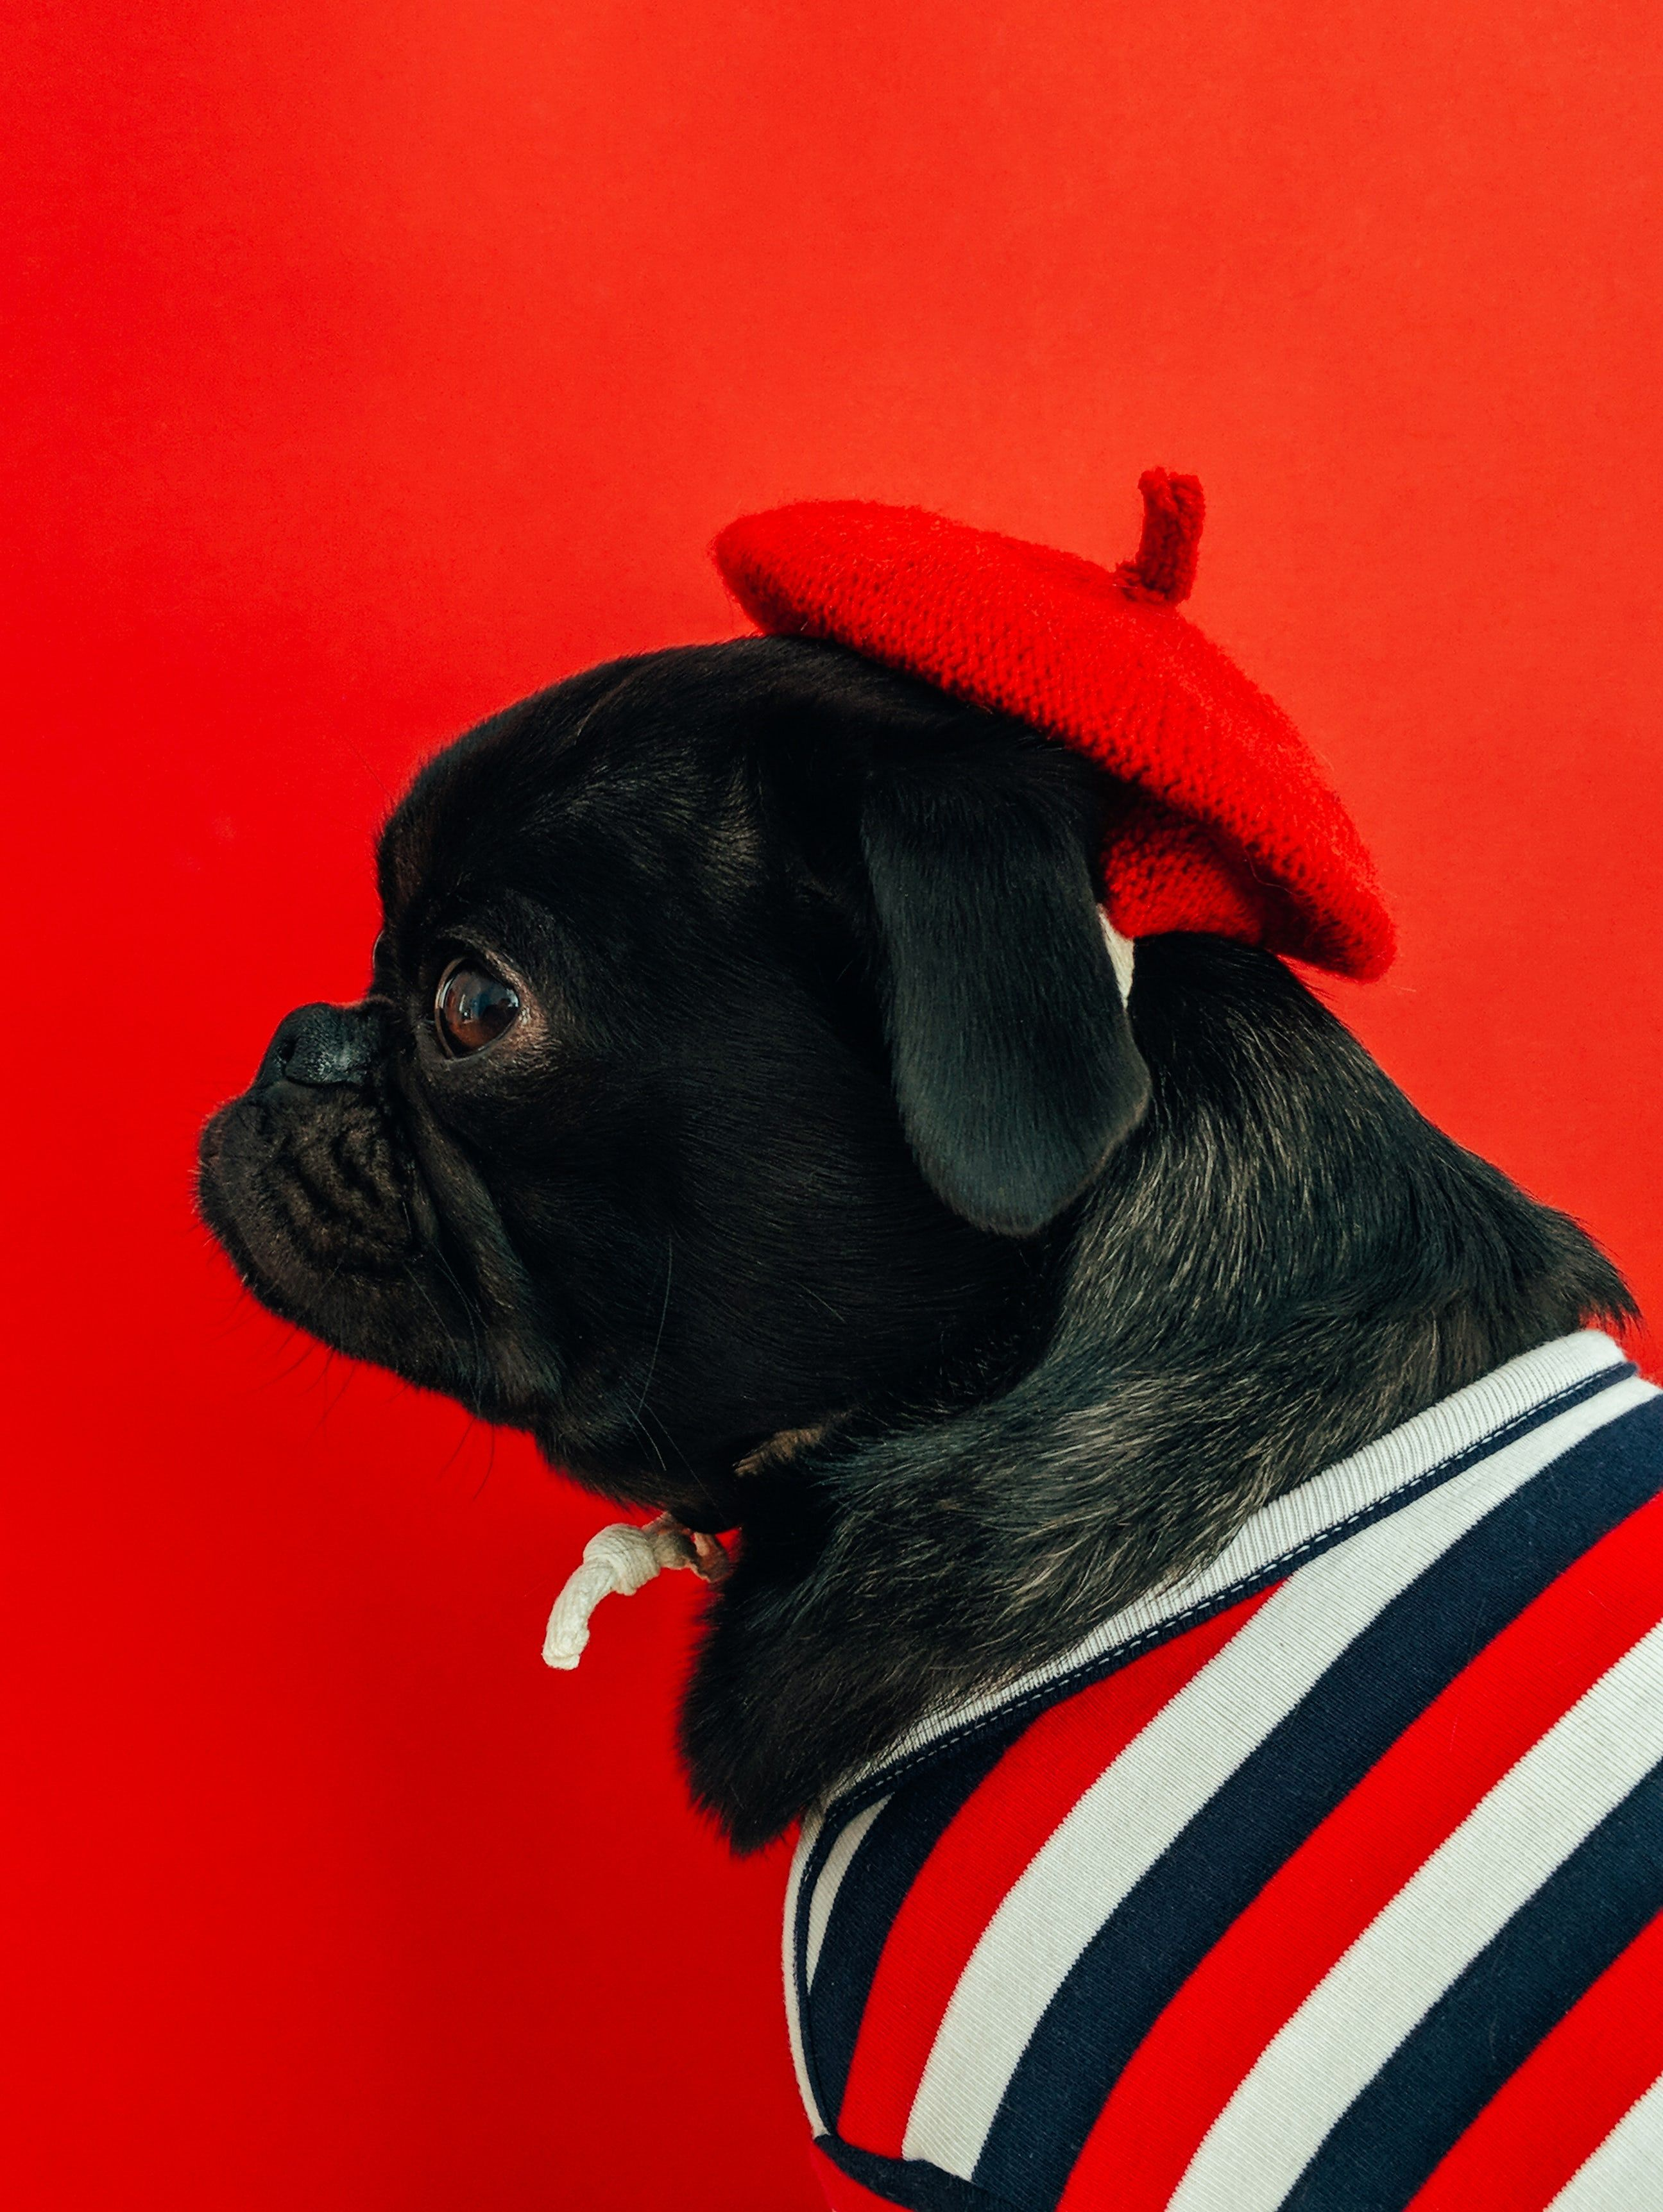 Best 100+ Dog Images Download Free Pictures on Unsplash